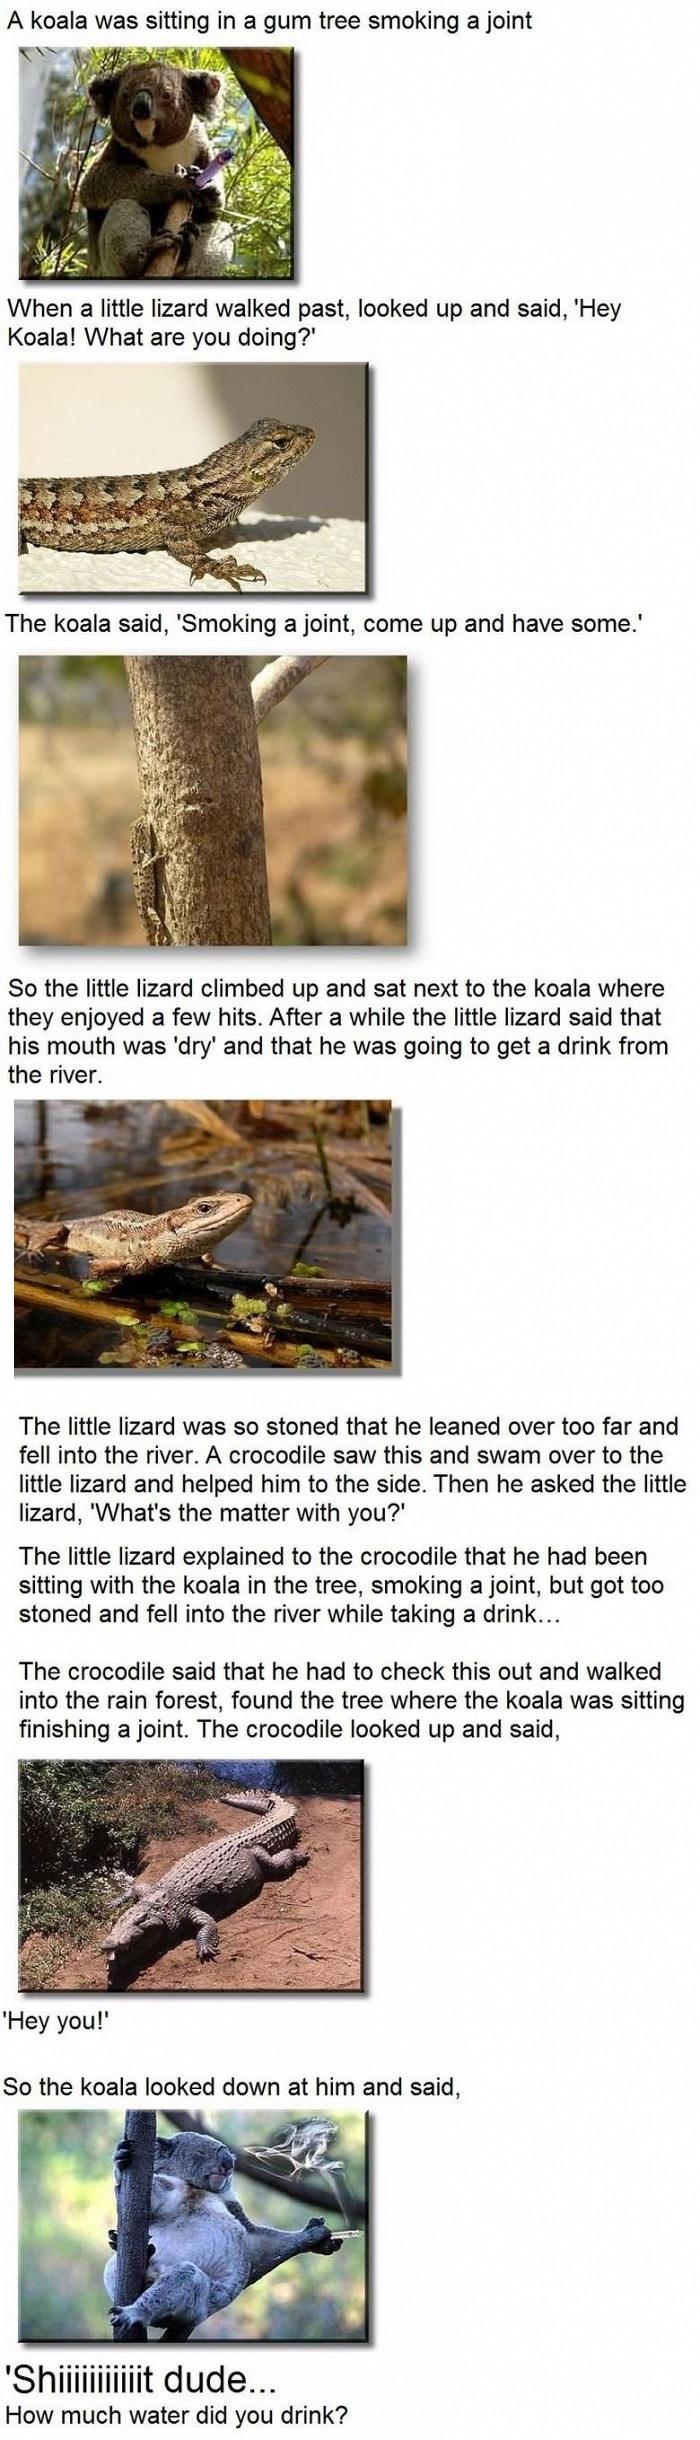 The koala and the lizard